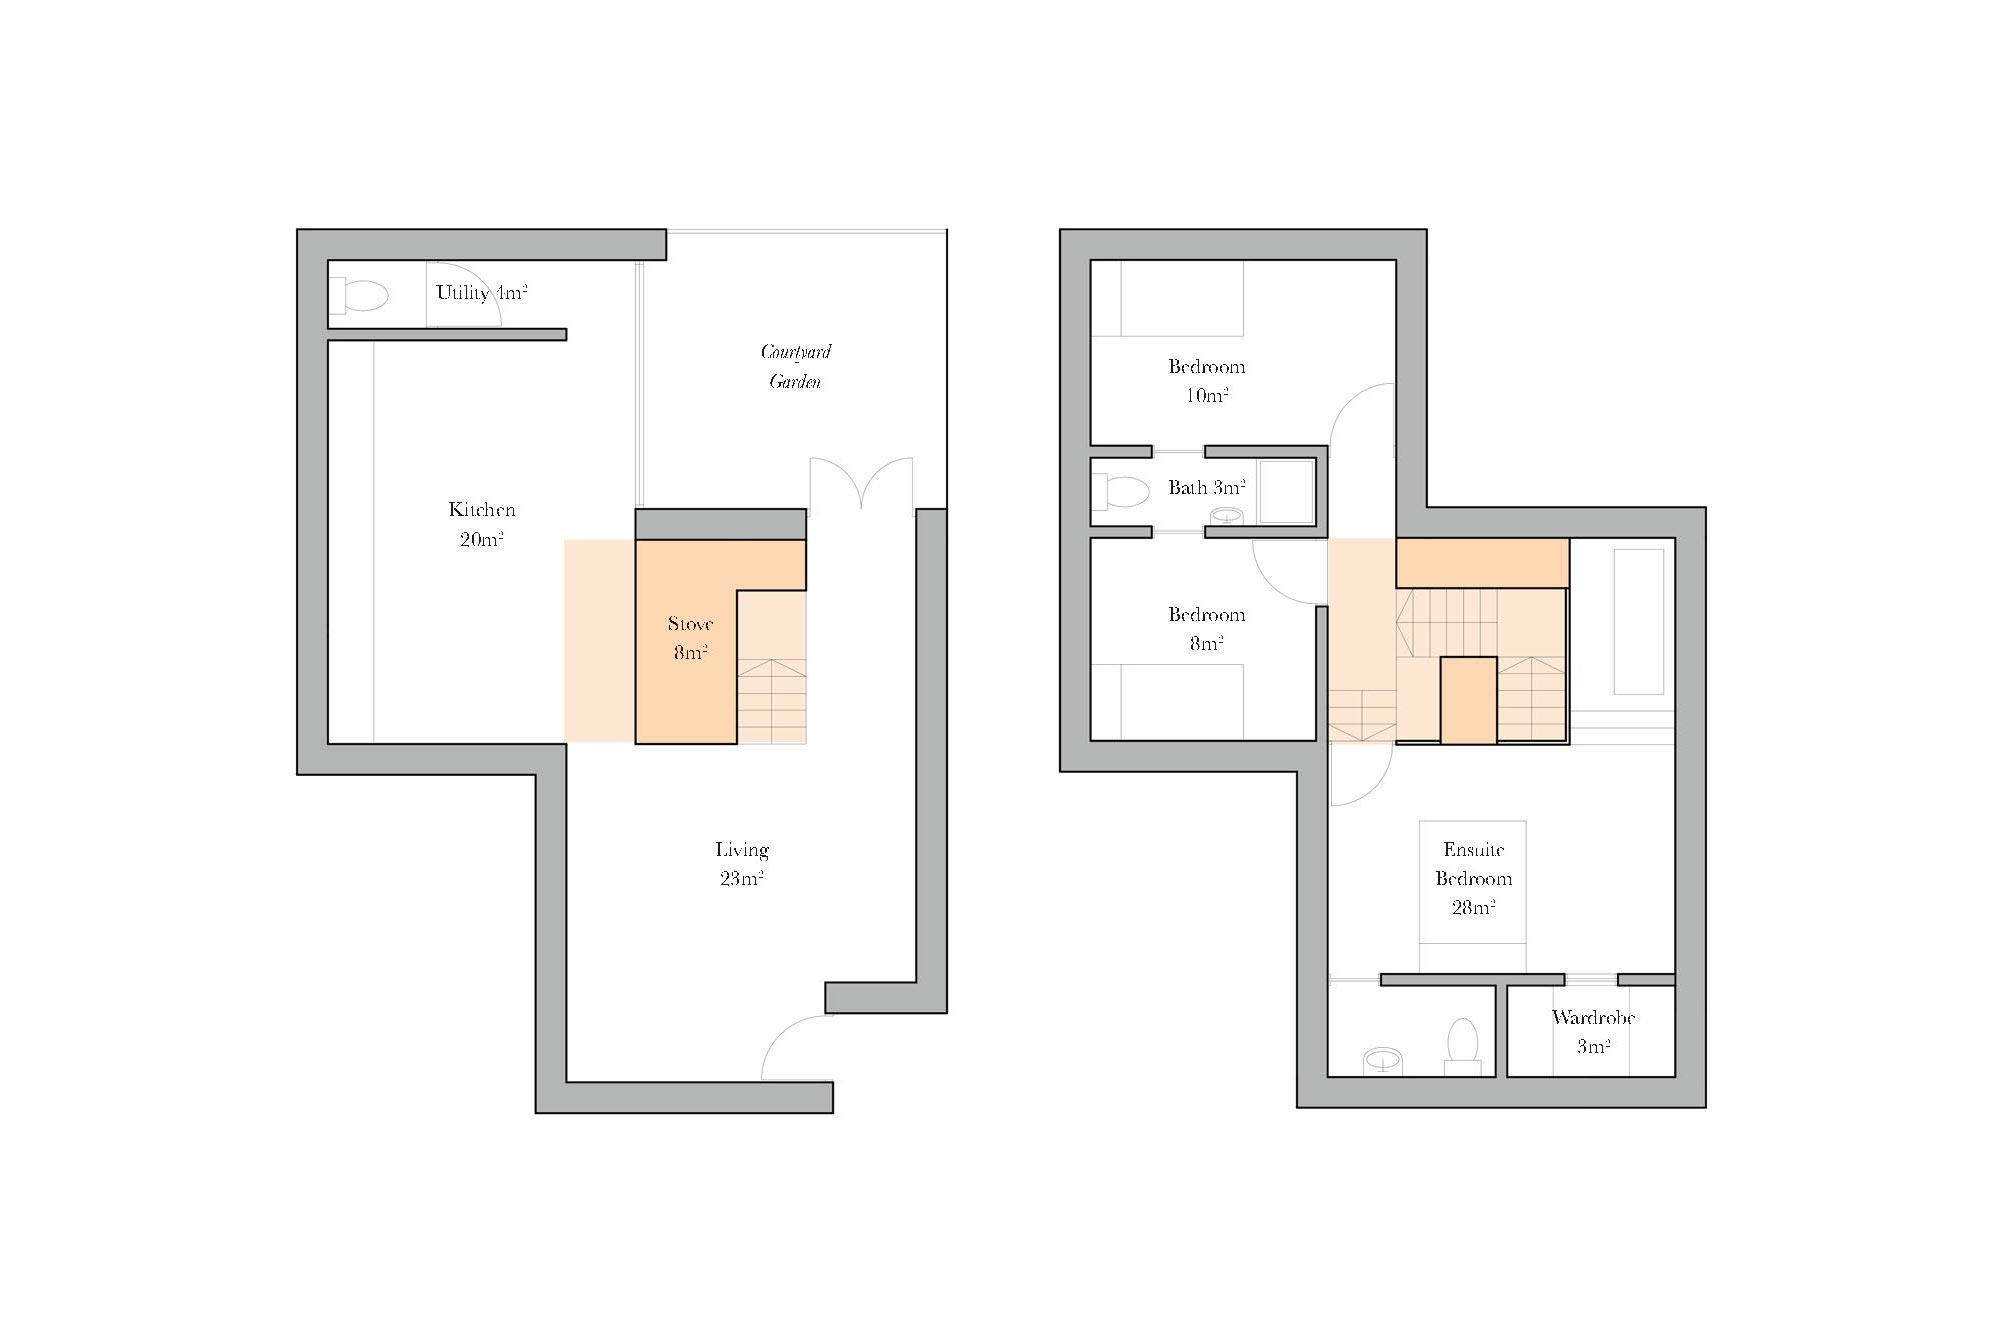 cube-haus-skene-catling-architects-cs-2000×1332-09